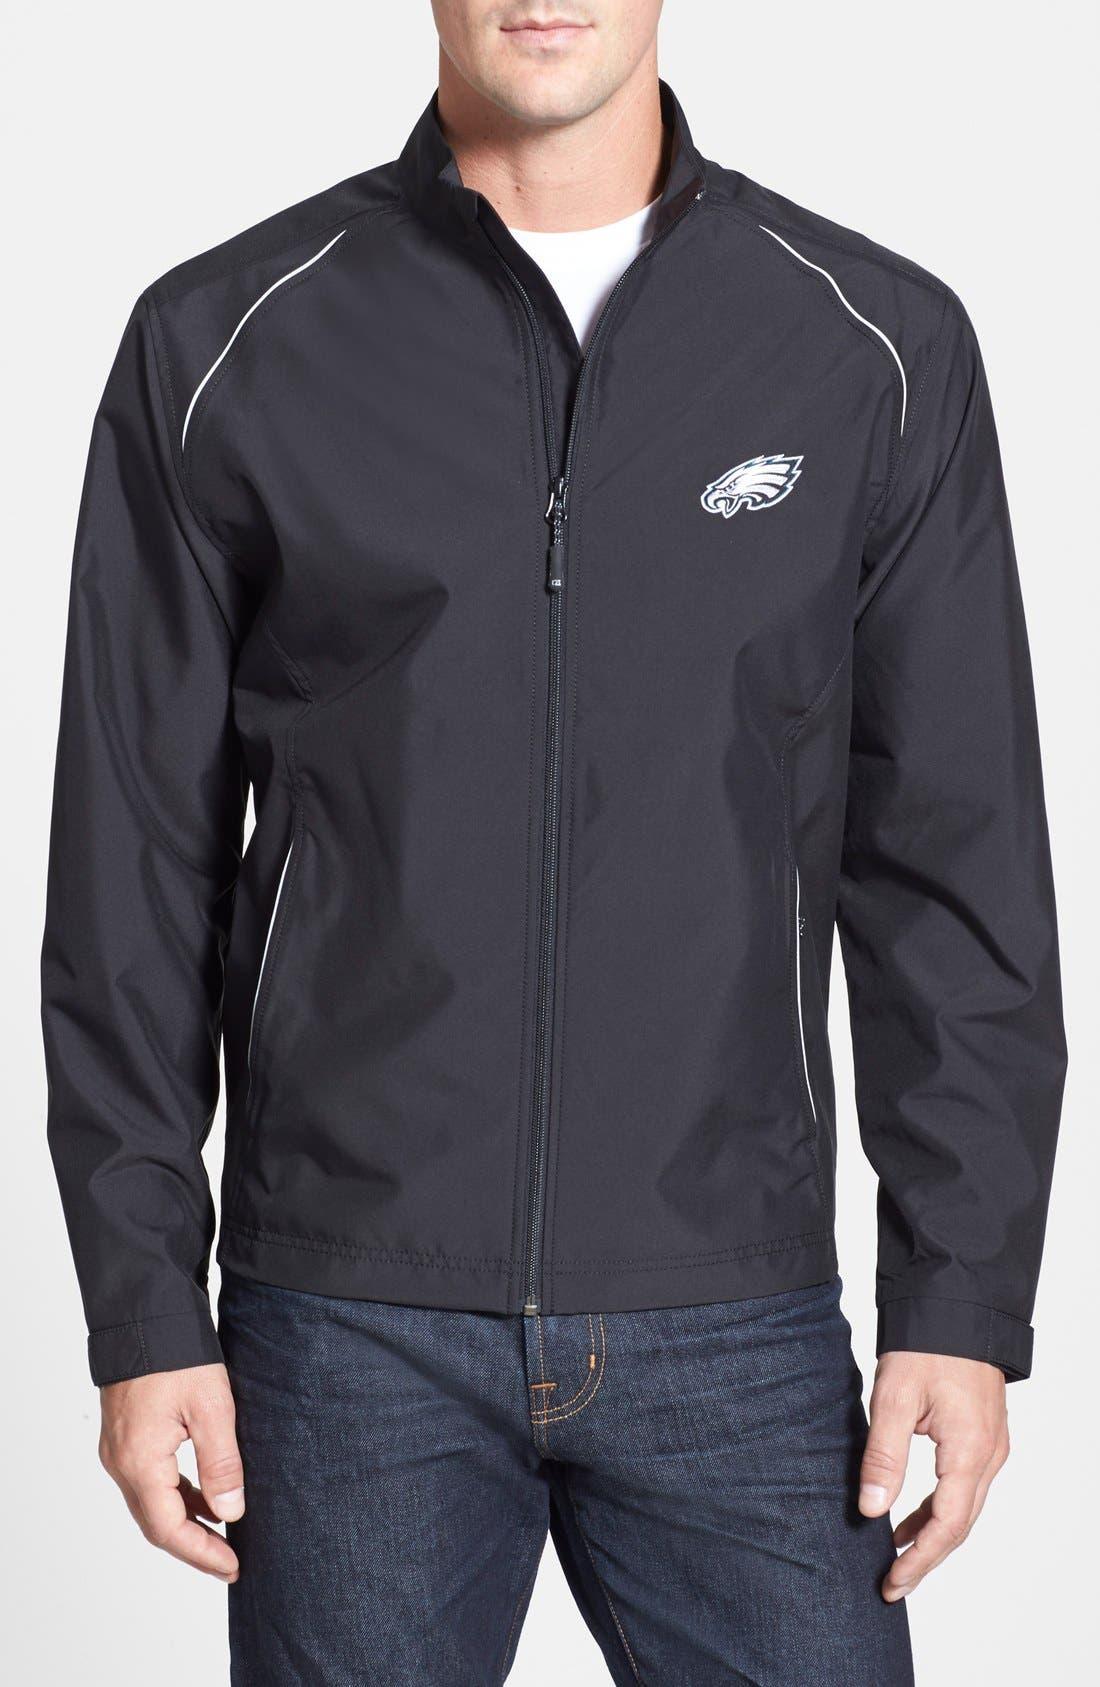 Philadelphia Eagles - Beacon WeatherTec Wind & Water Resistant Jacket,                         Main,                         color, Black